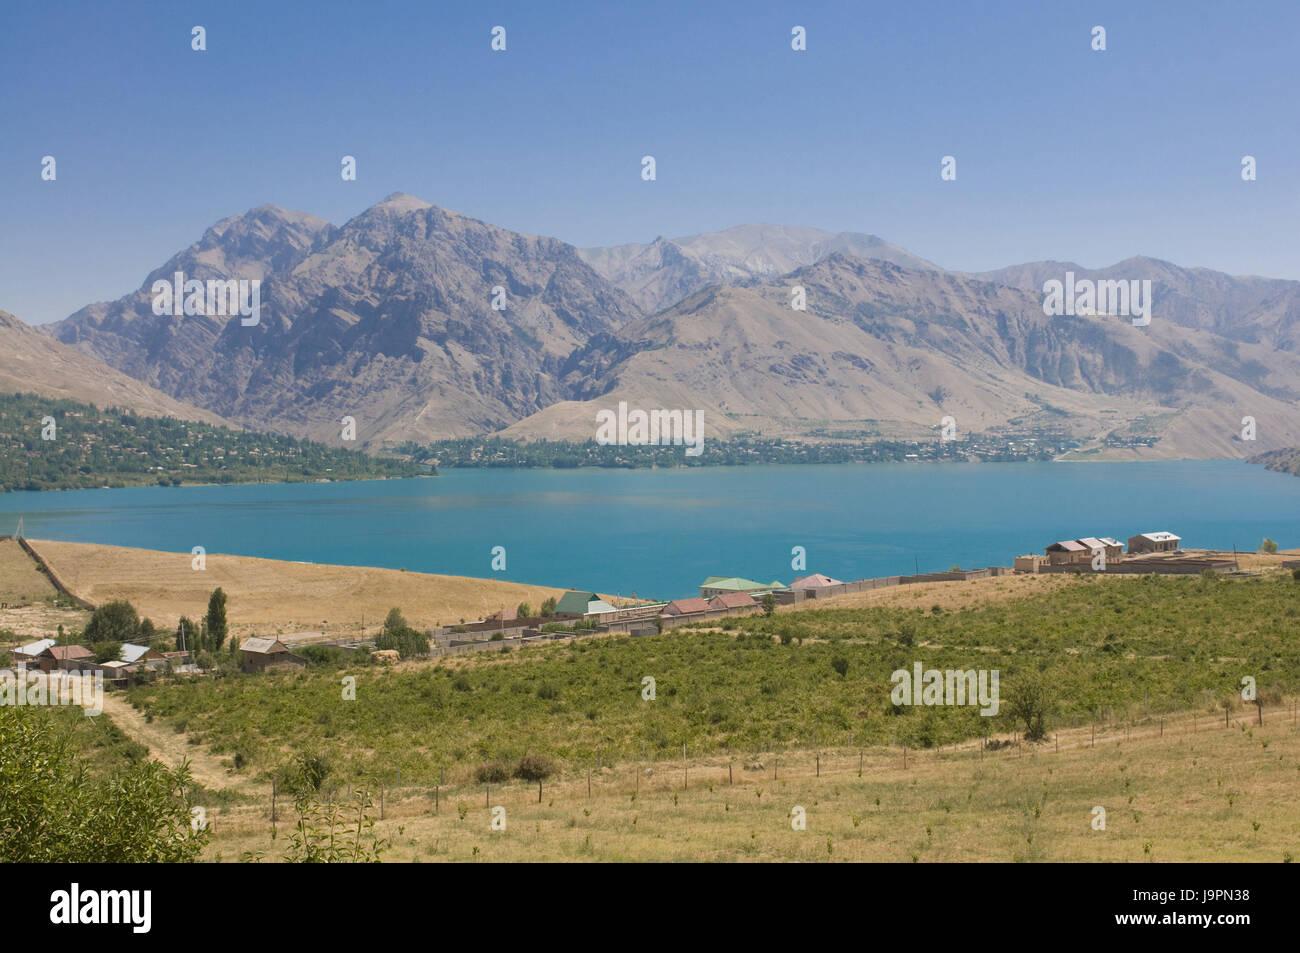 Chorvoq reservoir in the Ugam-Chatkal Nationwide park,Chimkar,Uzbekistan, Stock Photo